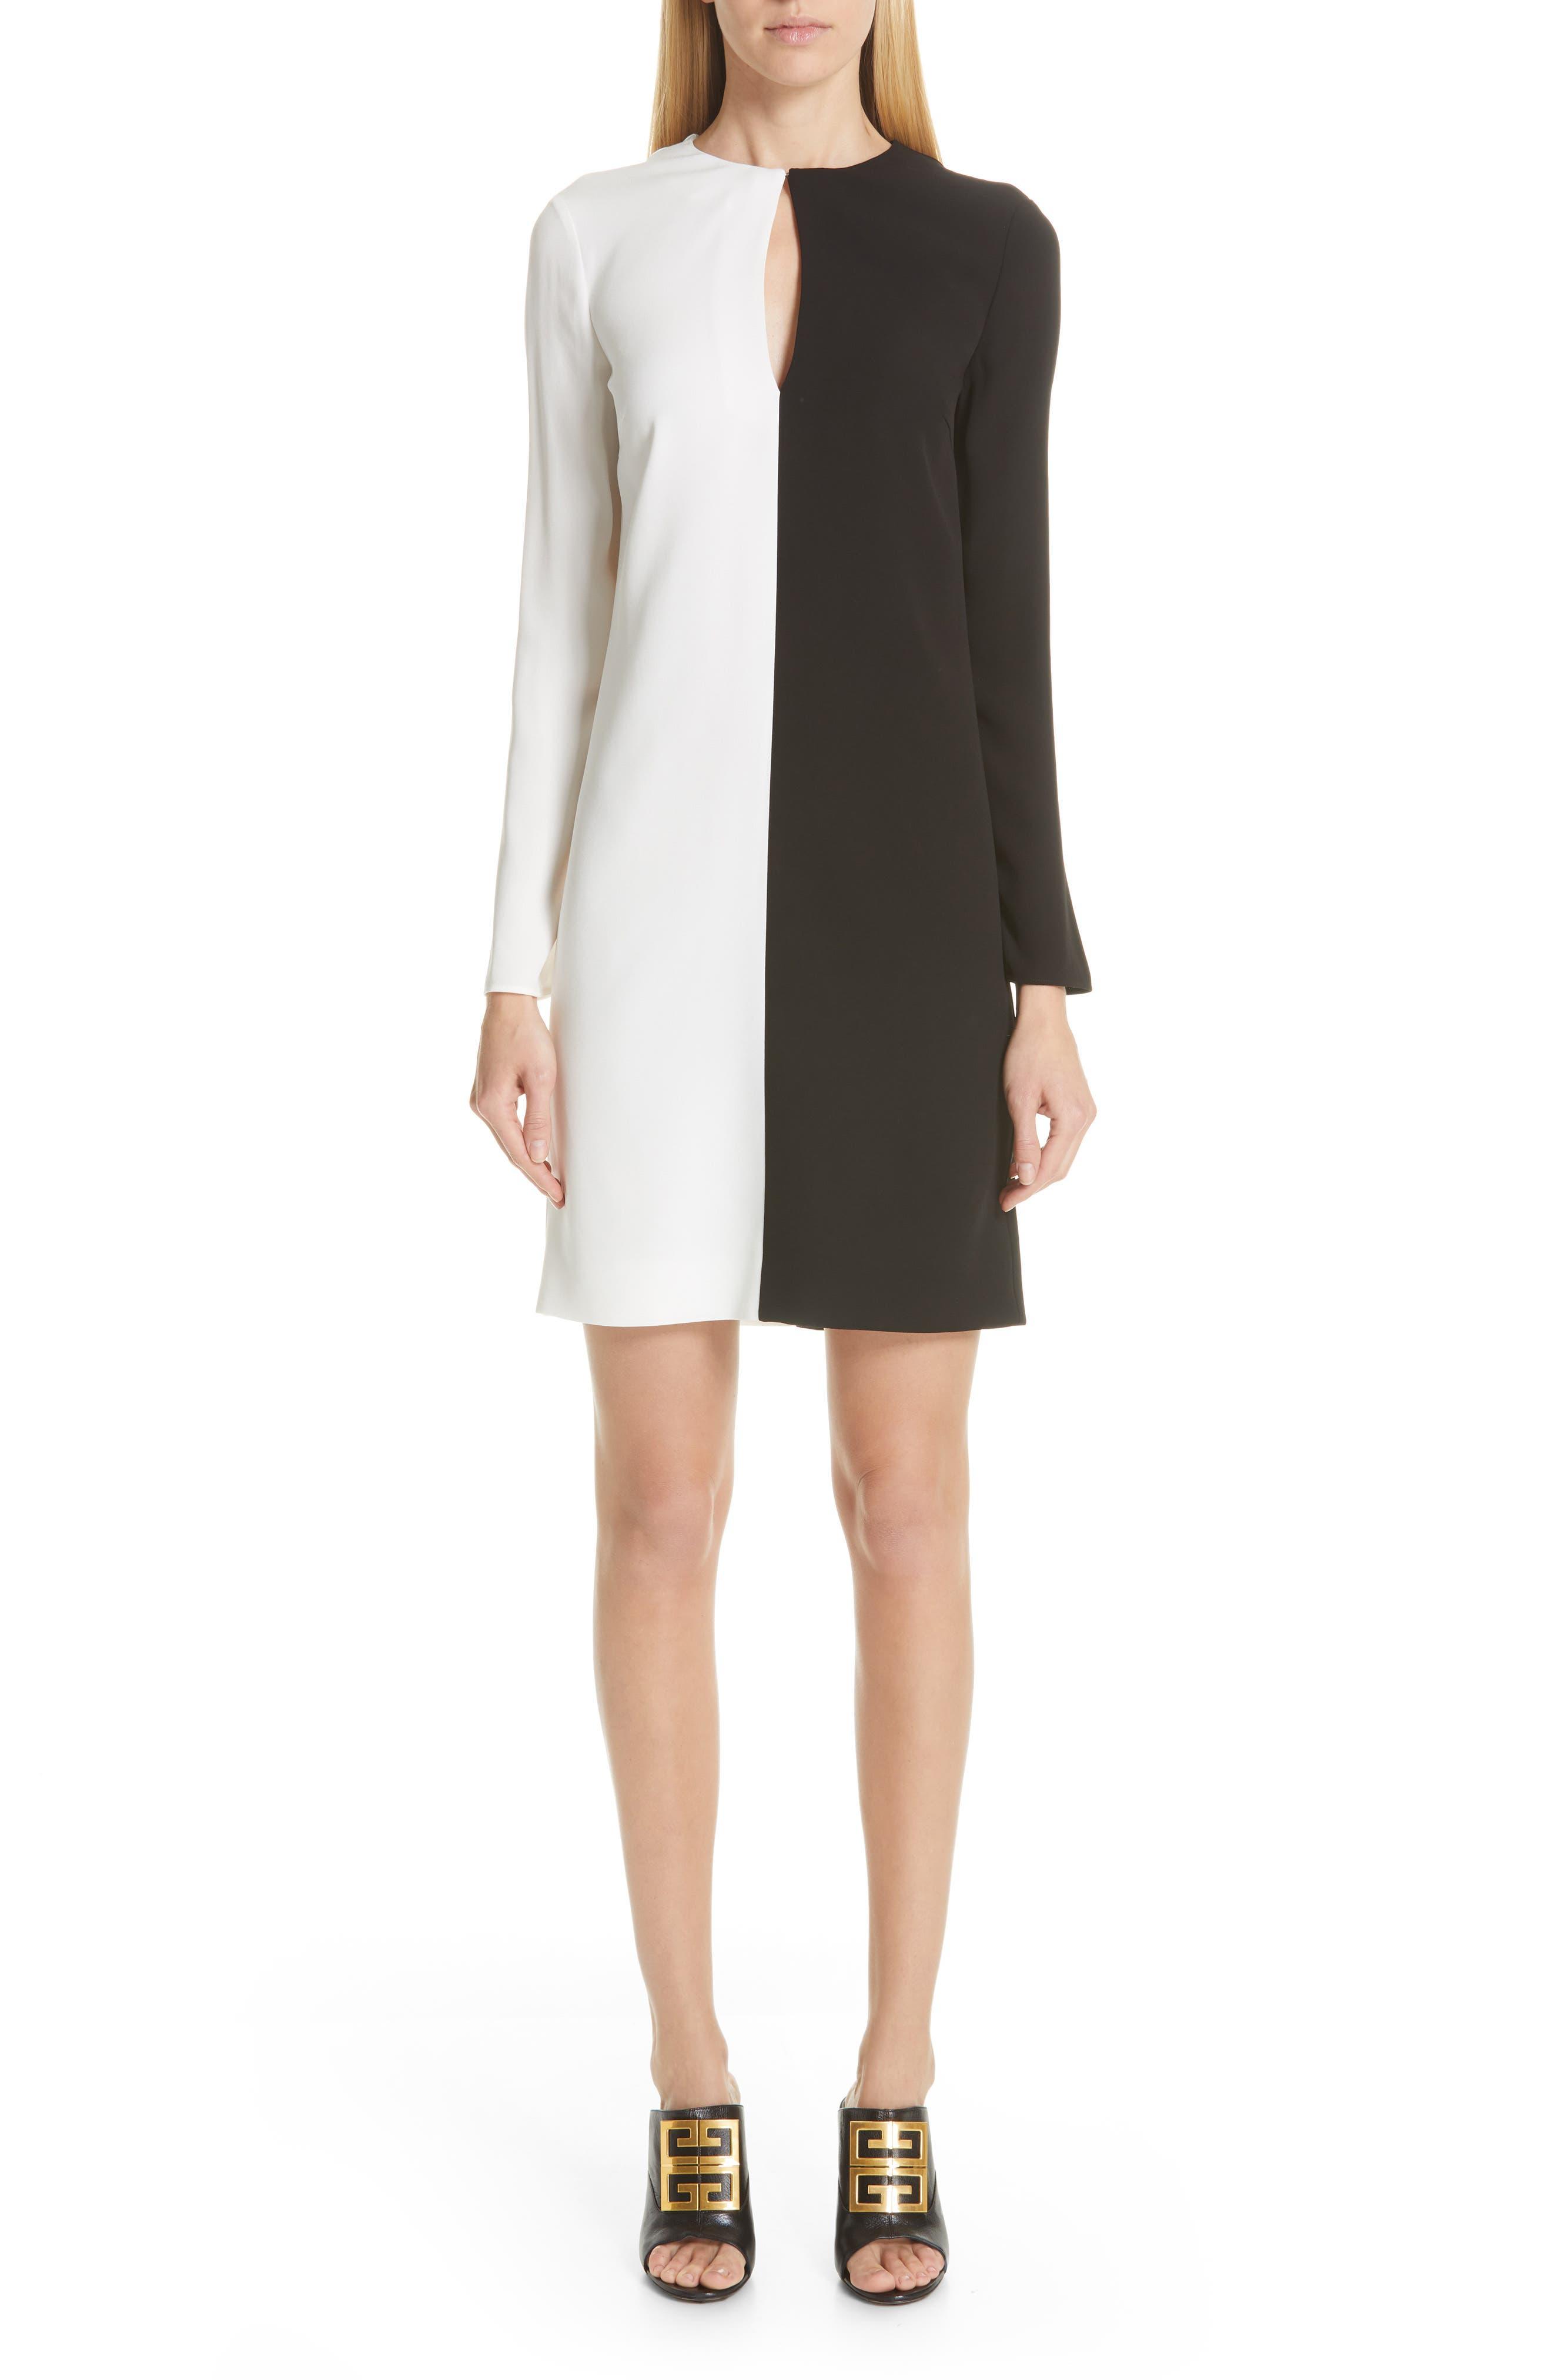 Givenchy Asymmetrical Bicolor Dress, 4 FR - Black